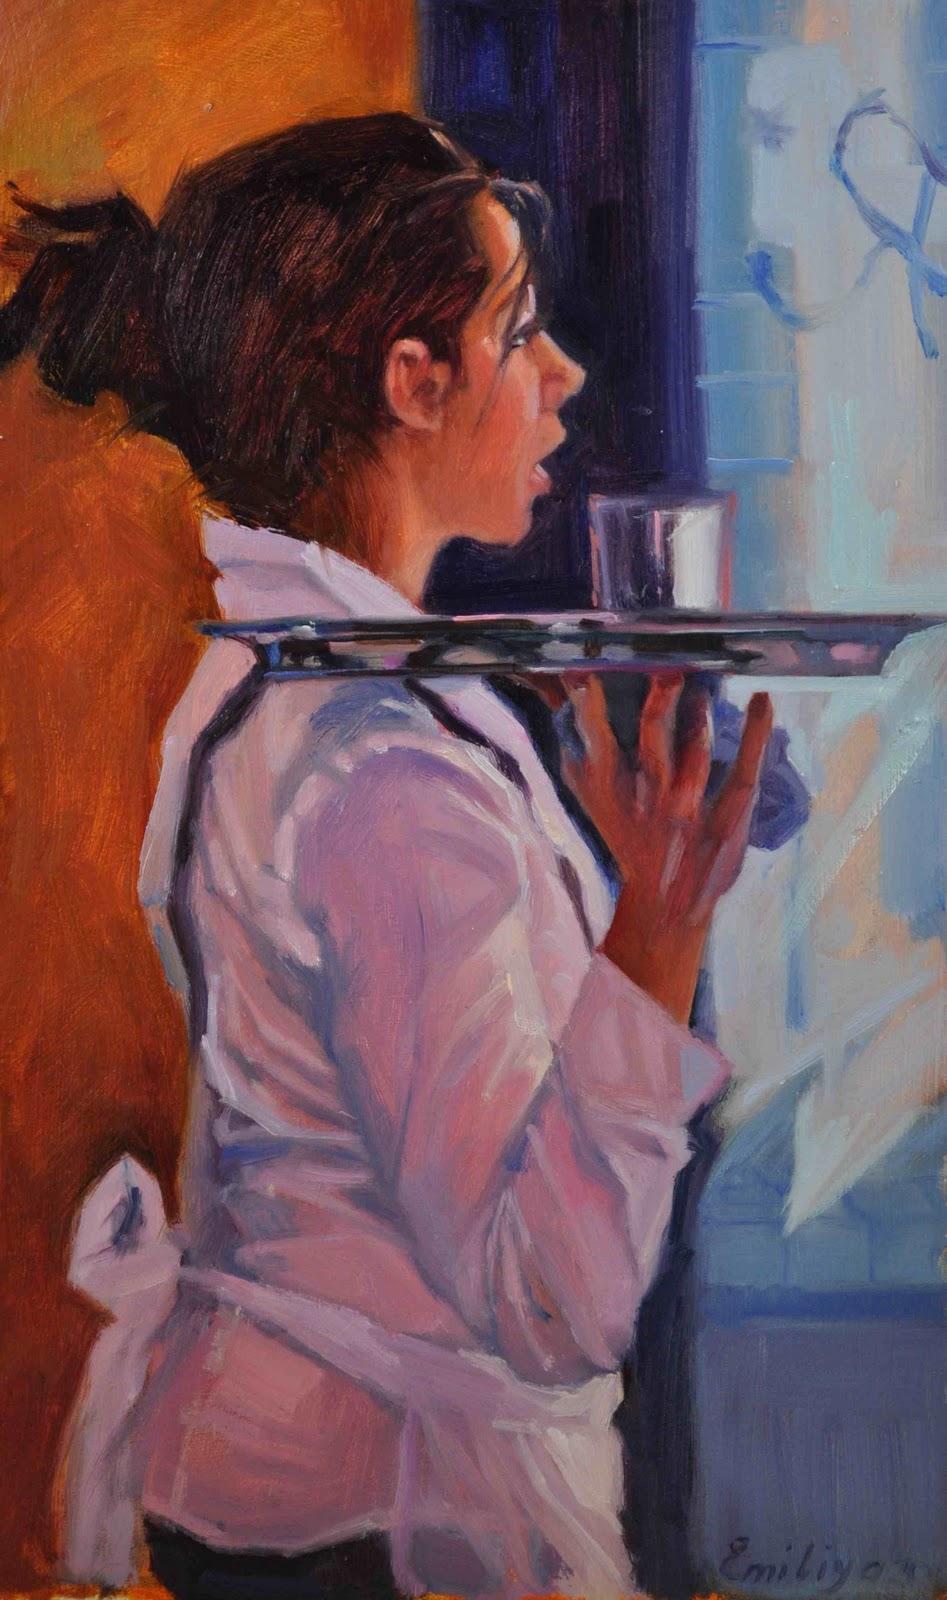 """Cafe Encounter 10x16 oil on gessoed board"" original fine art by Emiliya Lane"